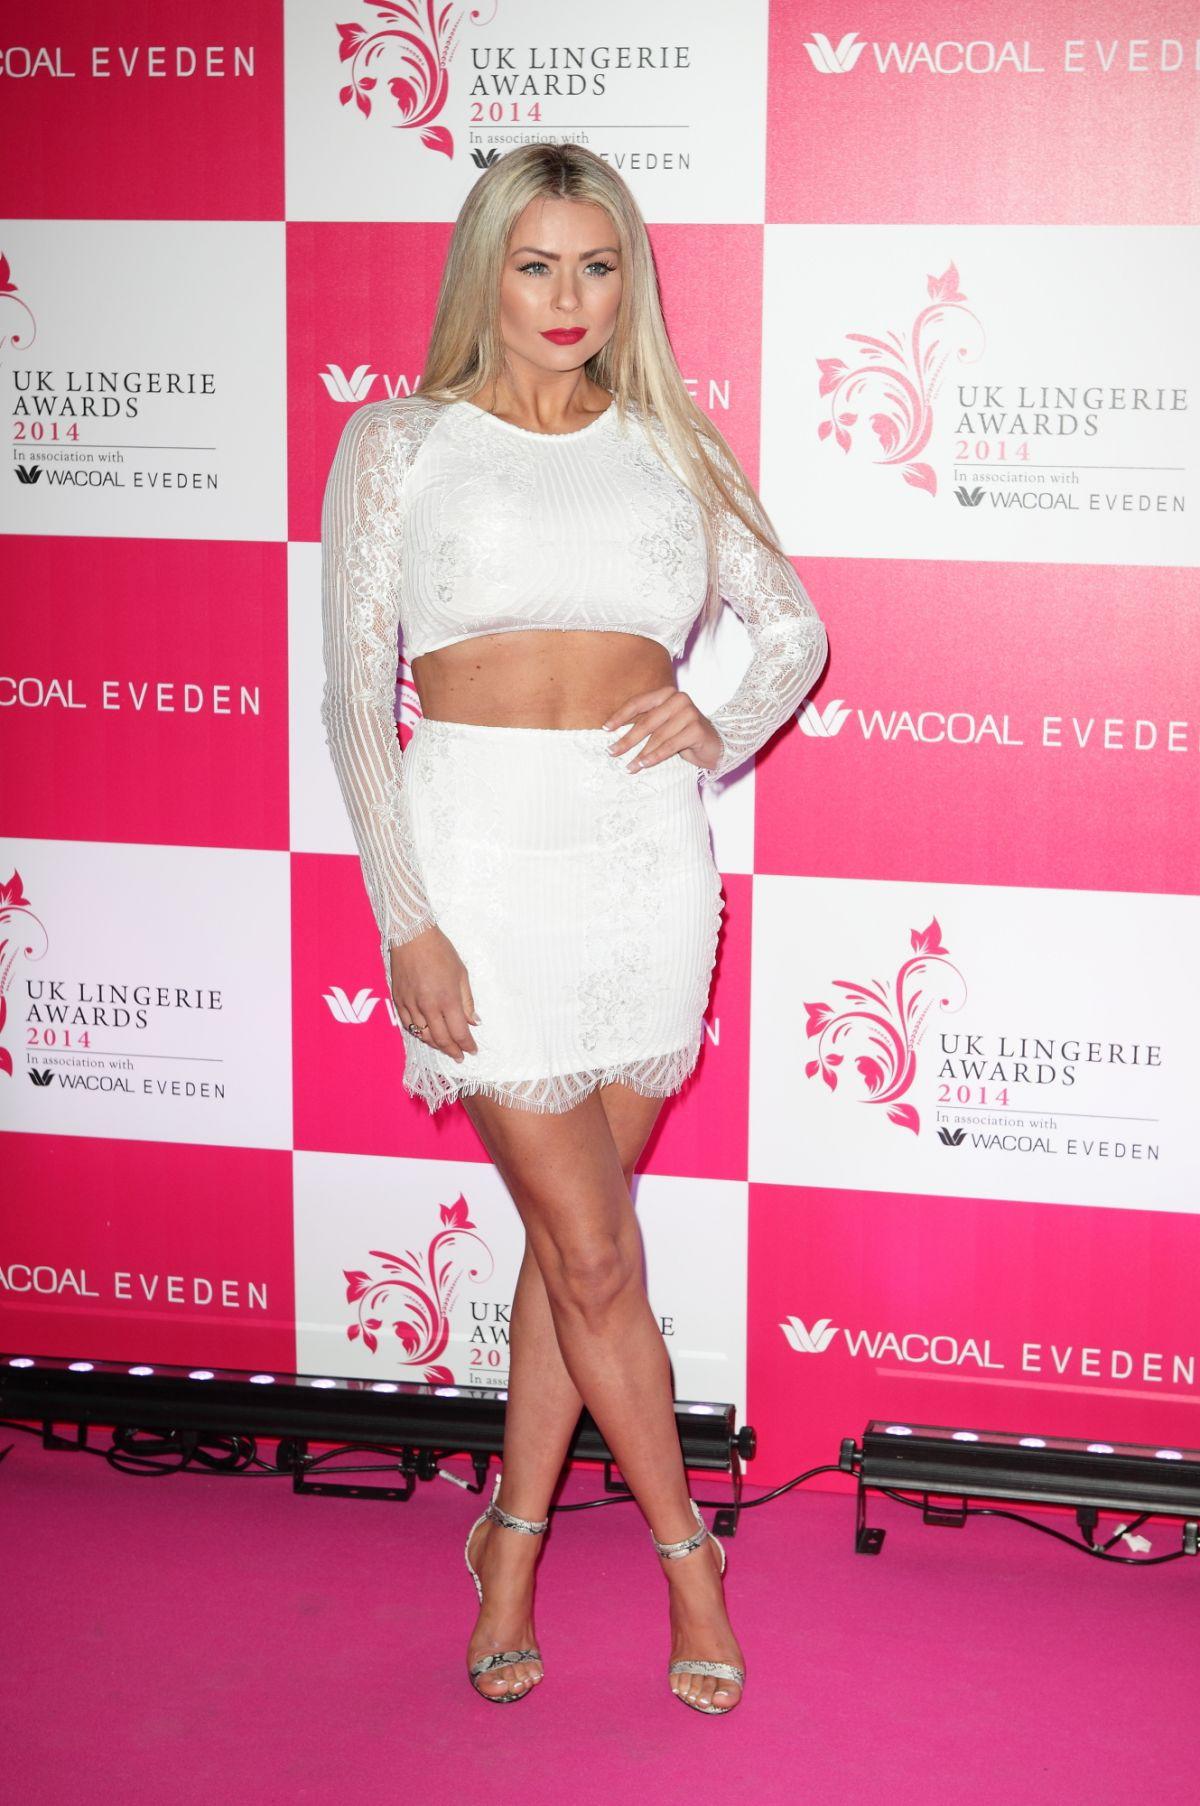 NICOLE MCLEAN at 2014 UK Lingerie Awards in London